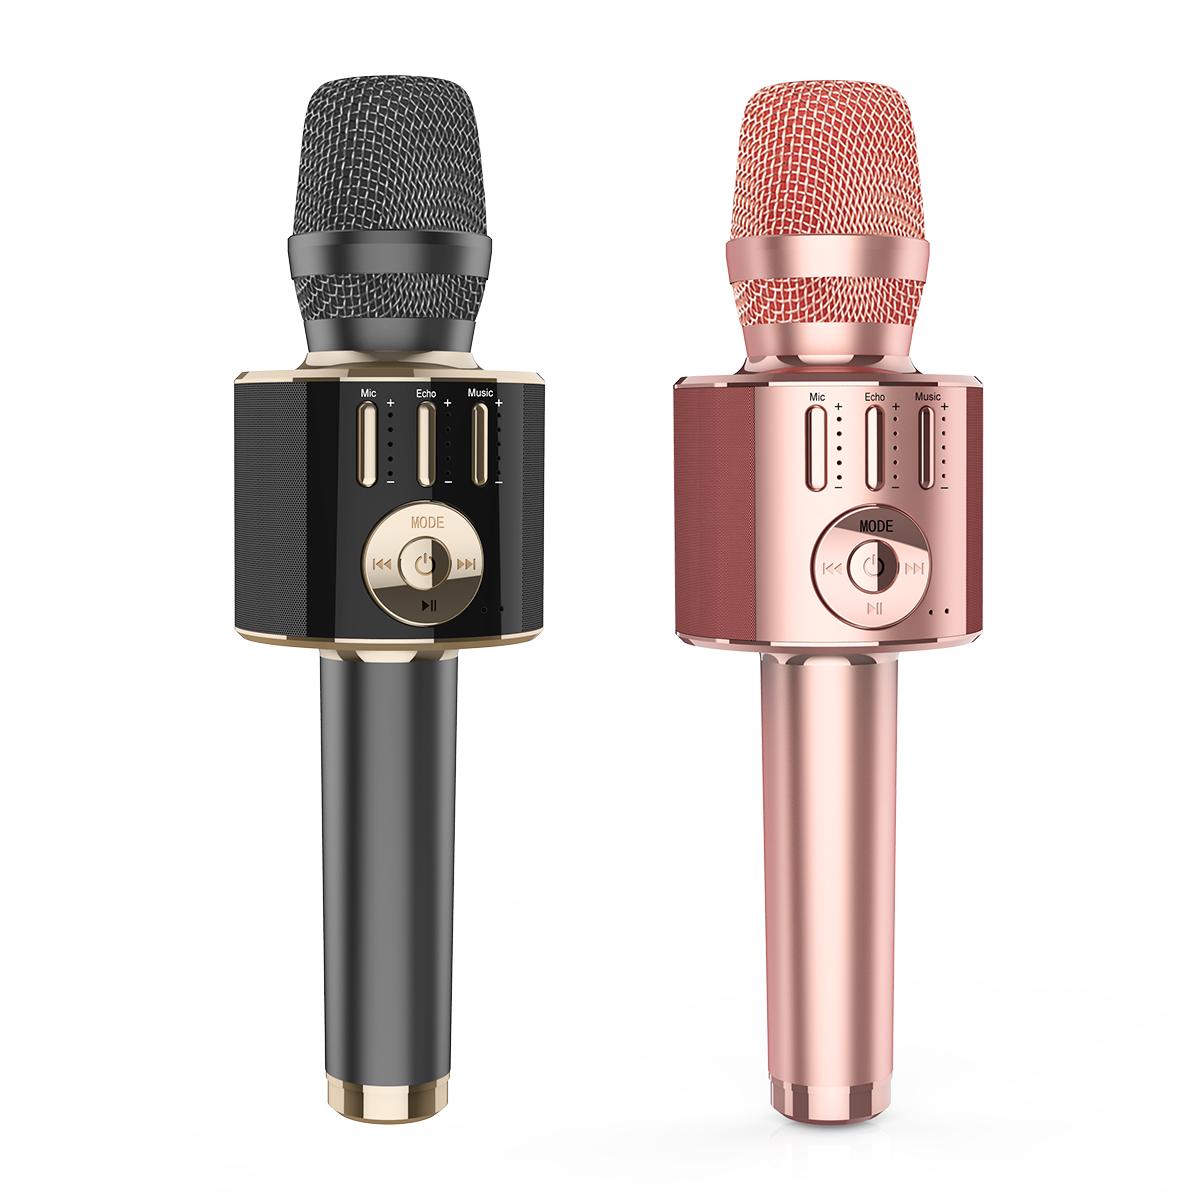 Gainstrong 7W 1800mAh handheld wireless karaoke microphone support microphone wireless karaoke professional and portable bluetoo